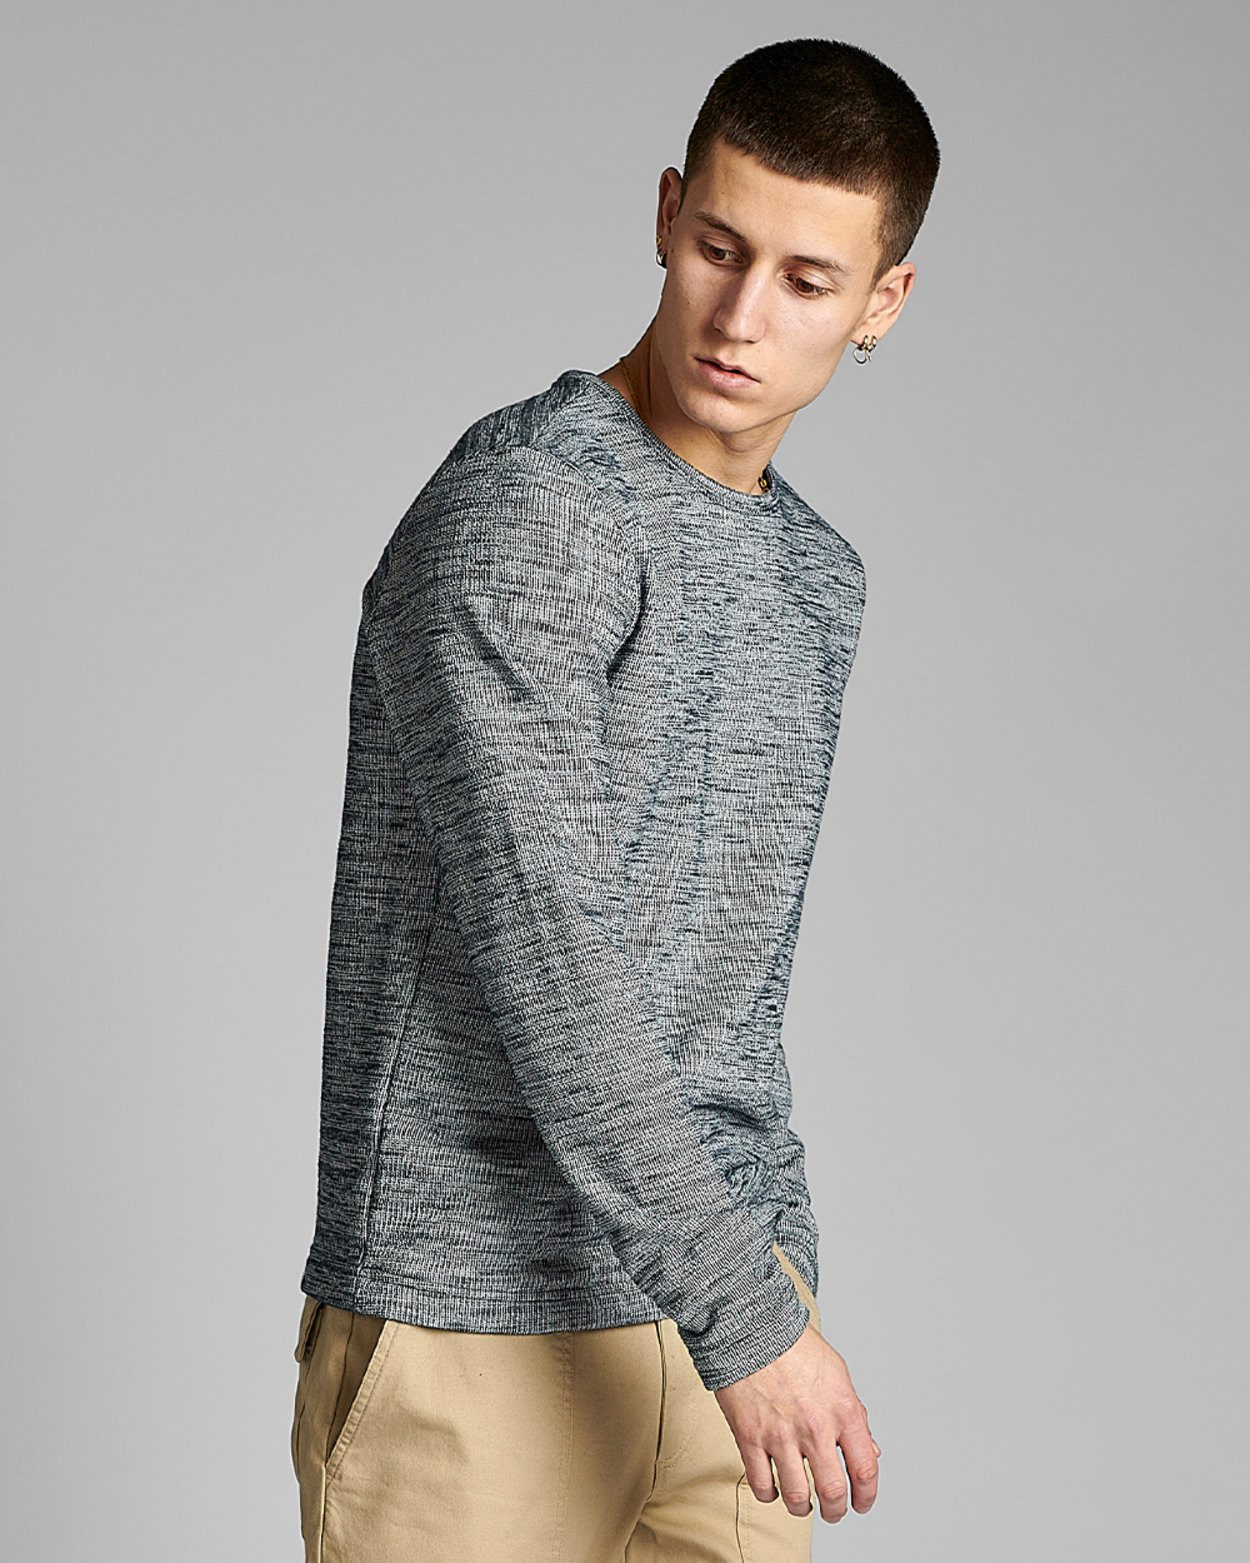 AKSail Sweatshirt